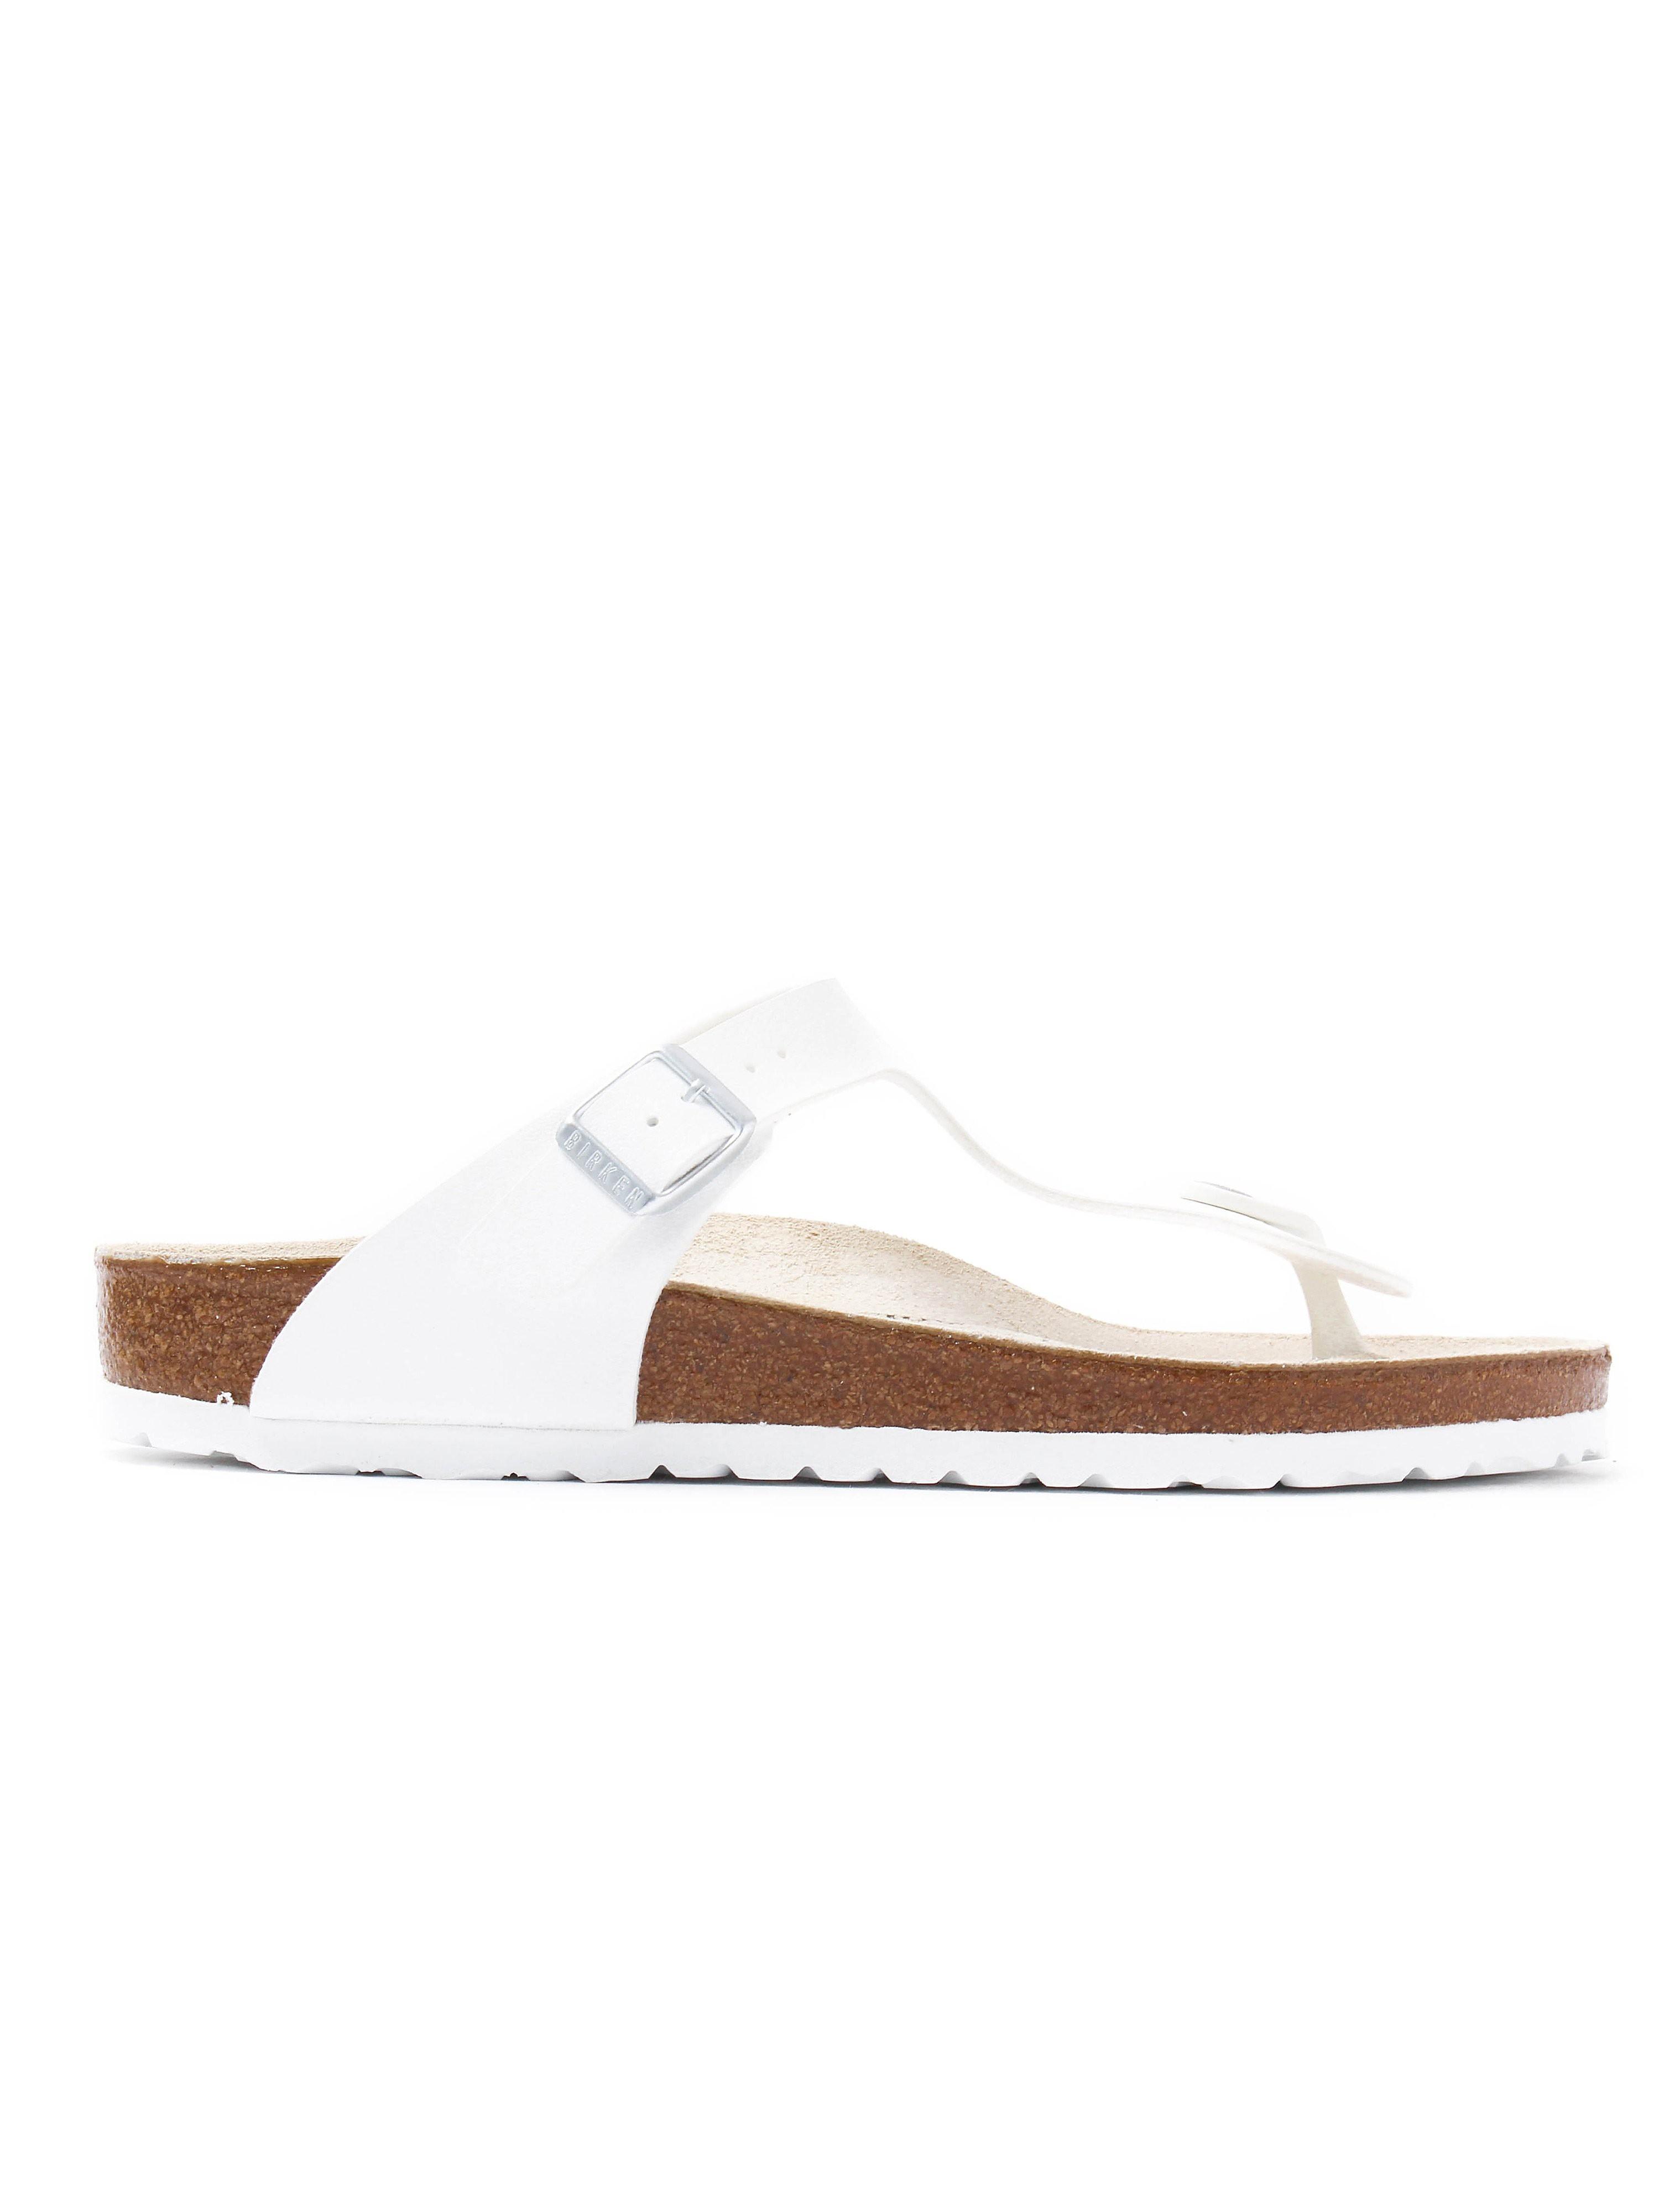 Birkenstock Women's Gizeh Toe Strap Sandals - White